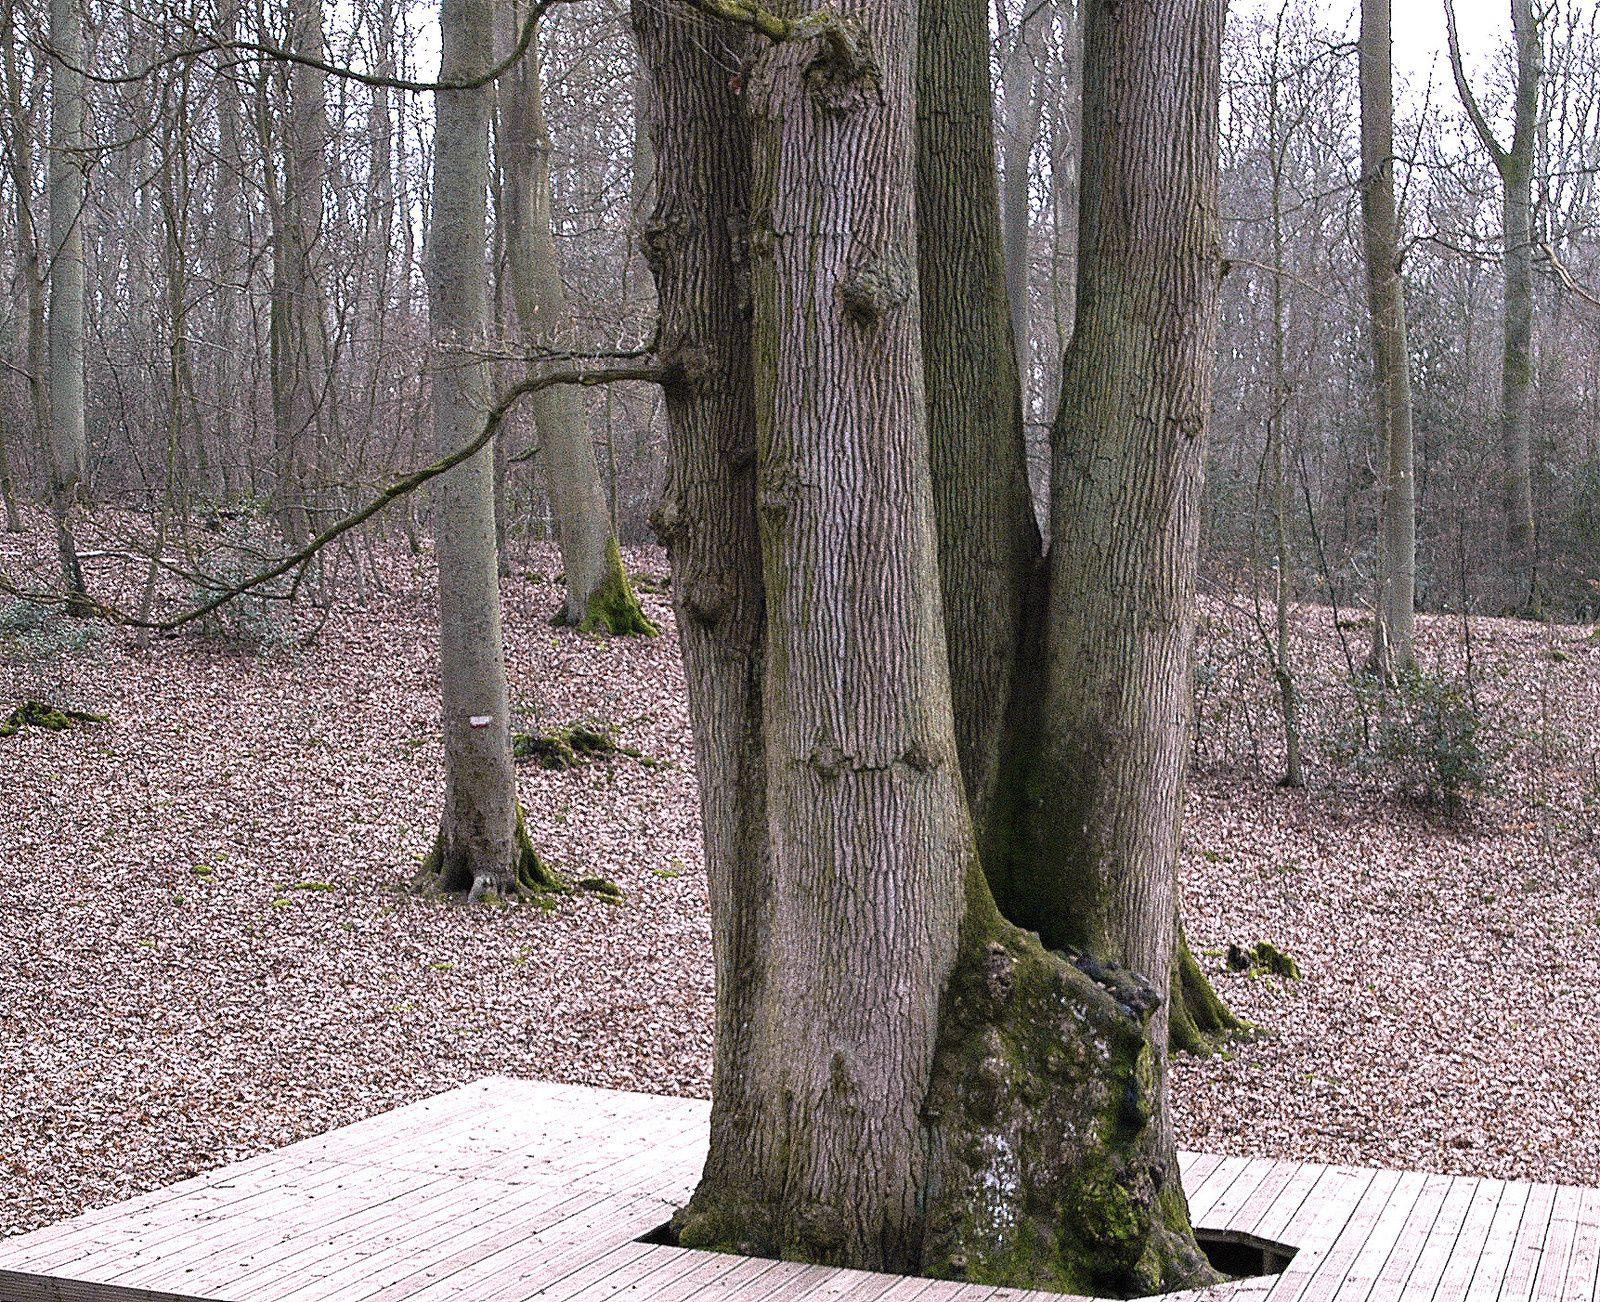 Le chêne cuve en 2007